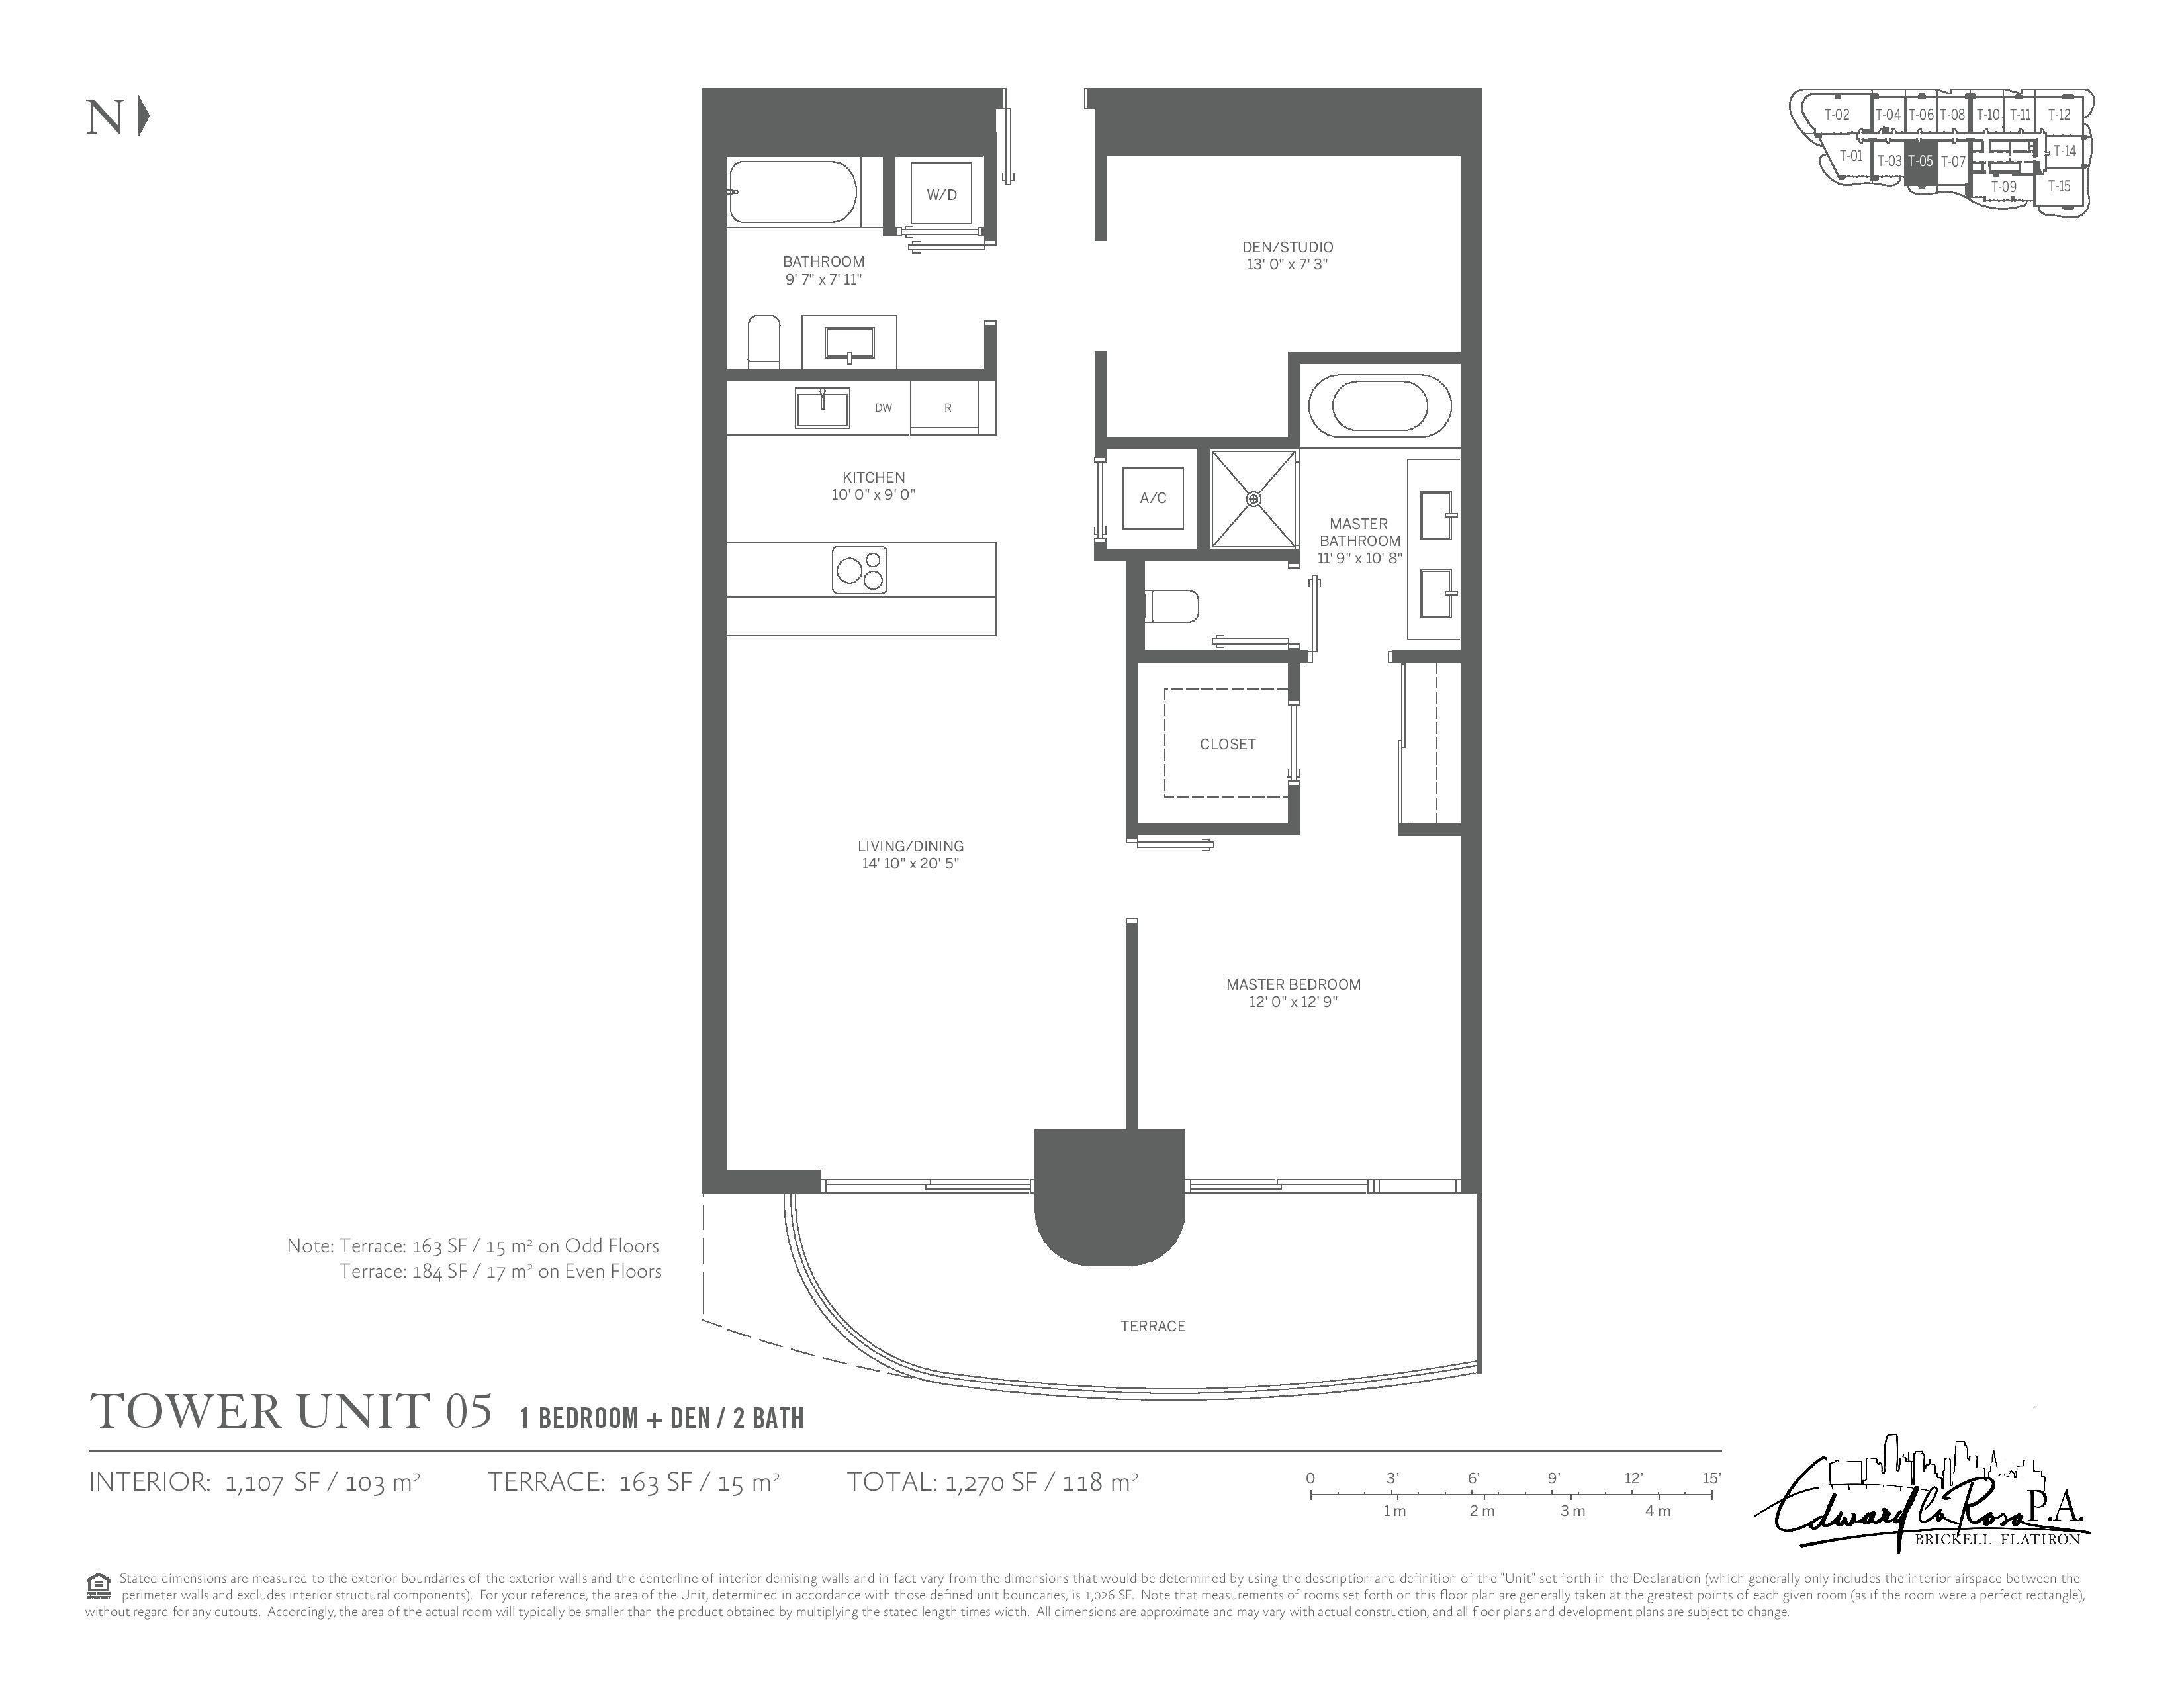 Floor Plans Brickell Flatiron Miami Florida Floor Plans Brickell Flatiron Condo Floor Plans